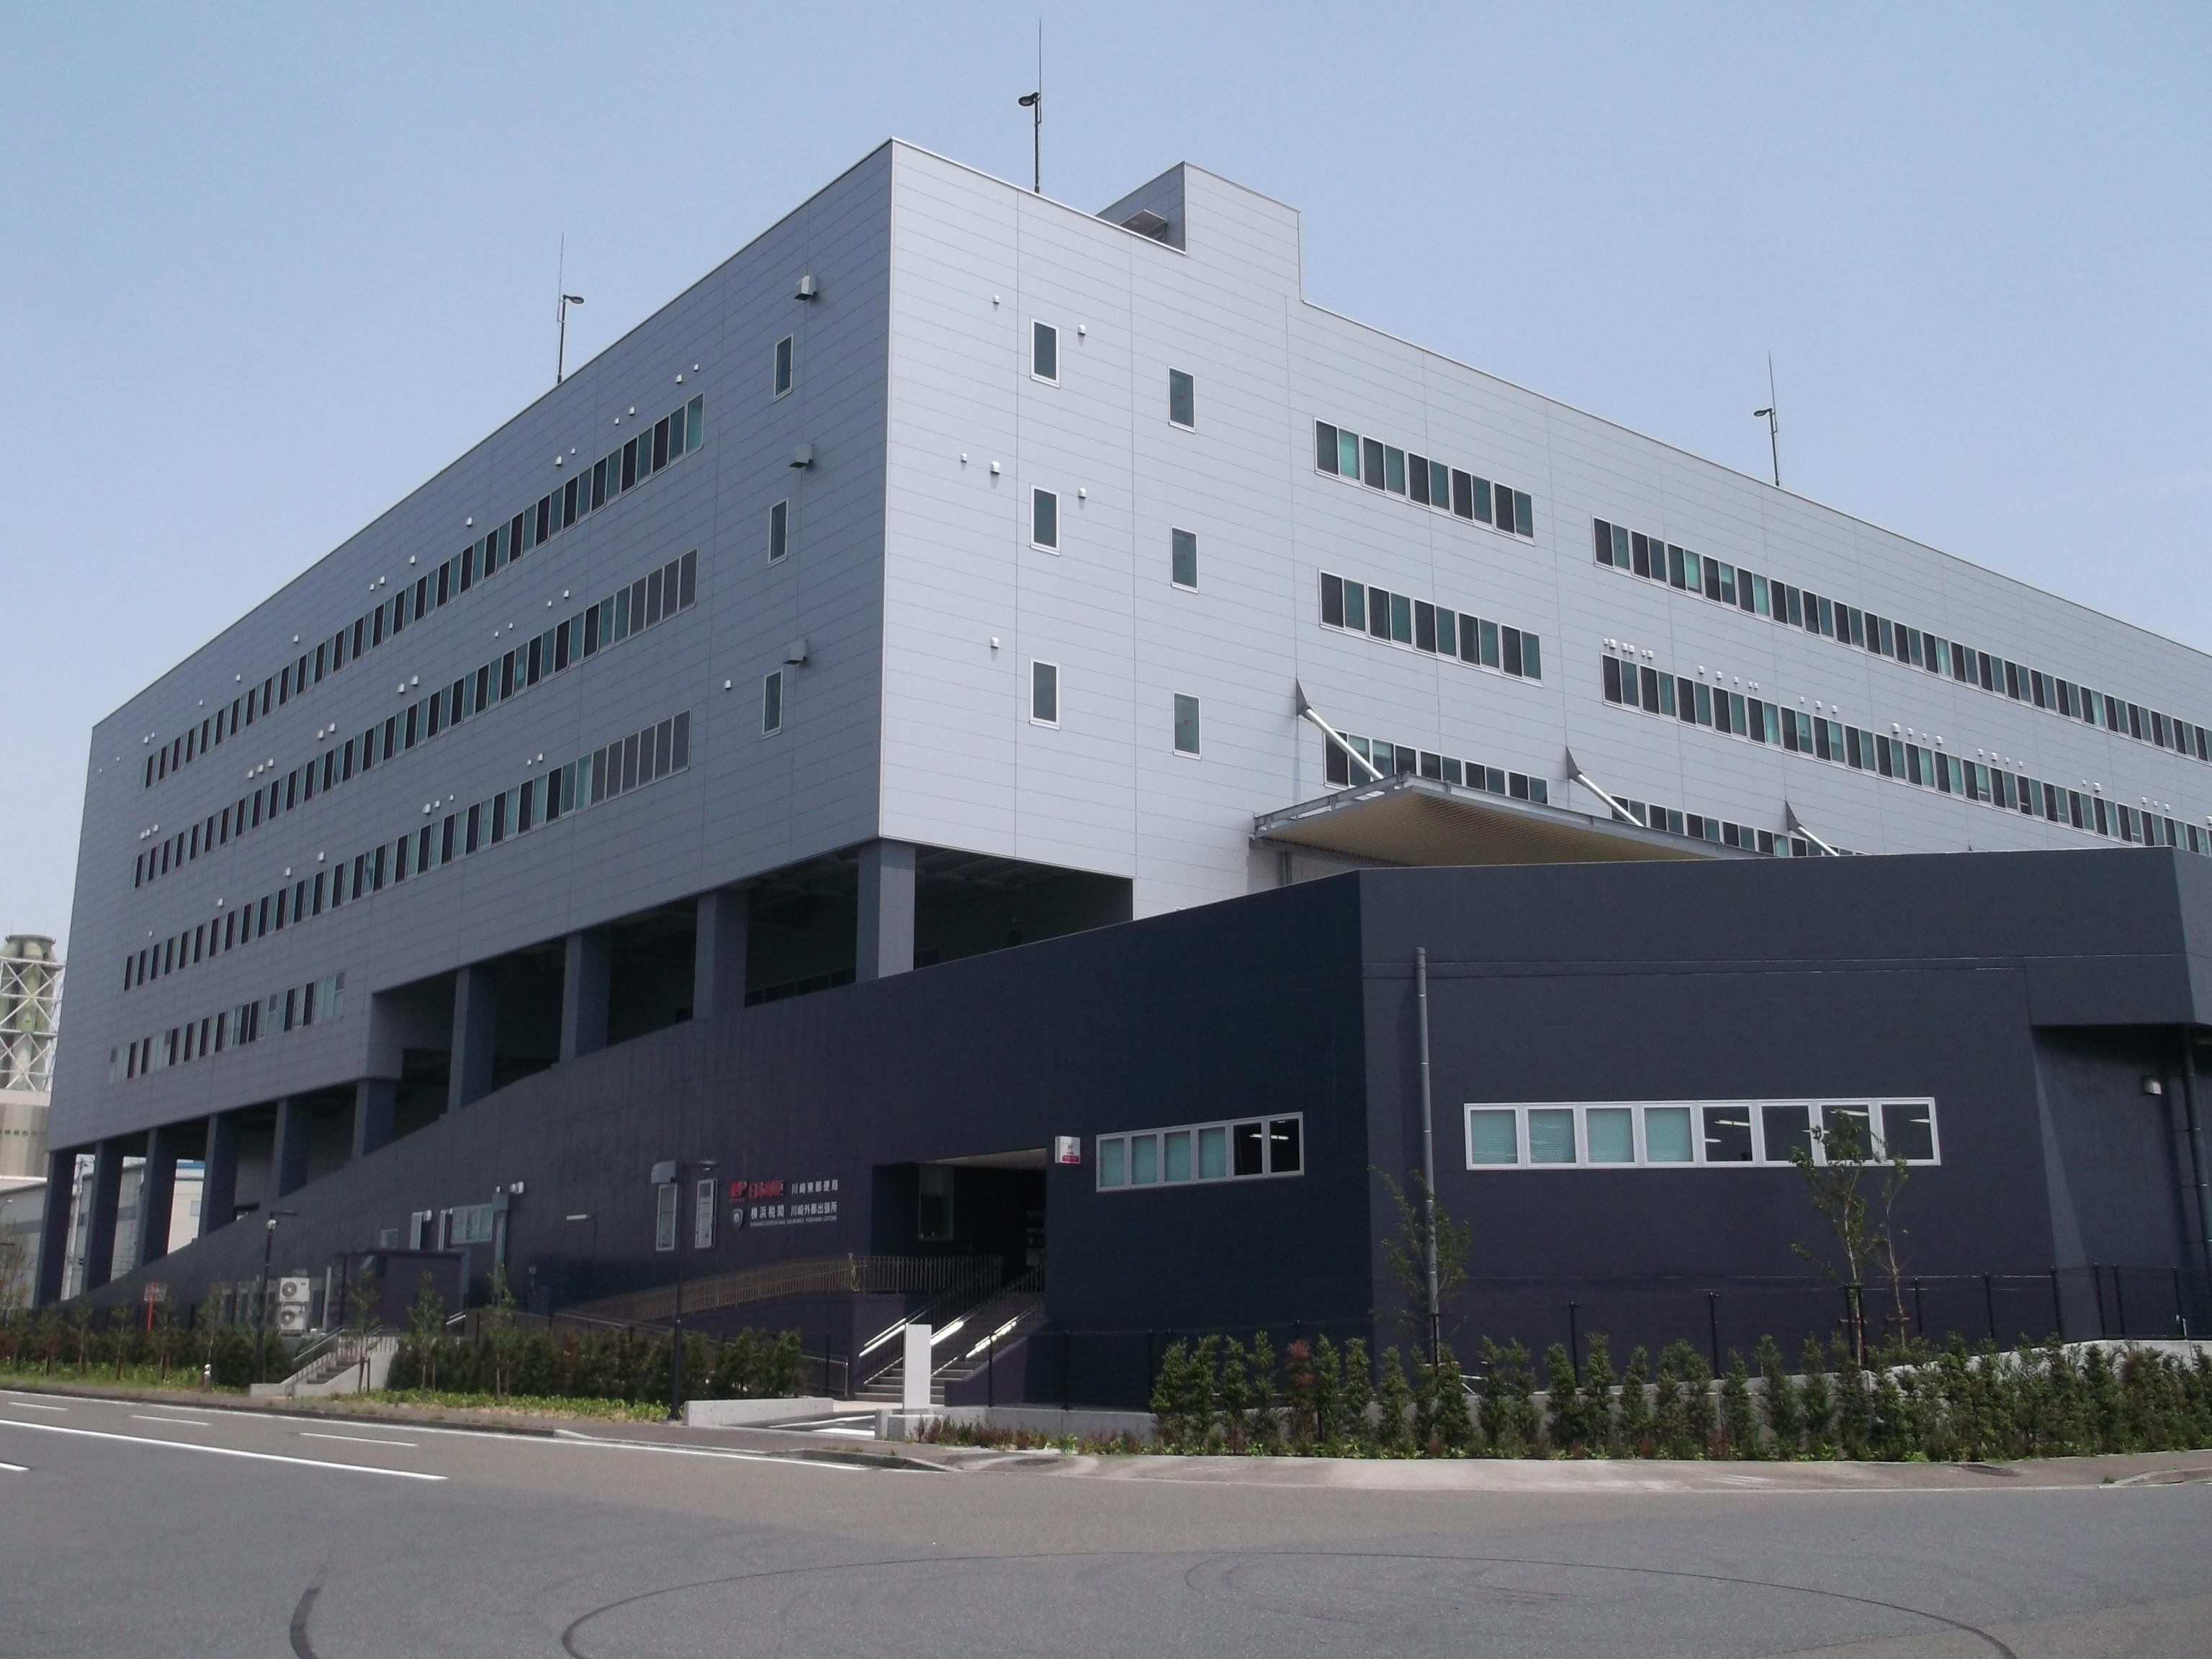 川崎東郵便局 - Wikipedia